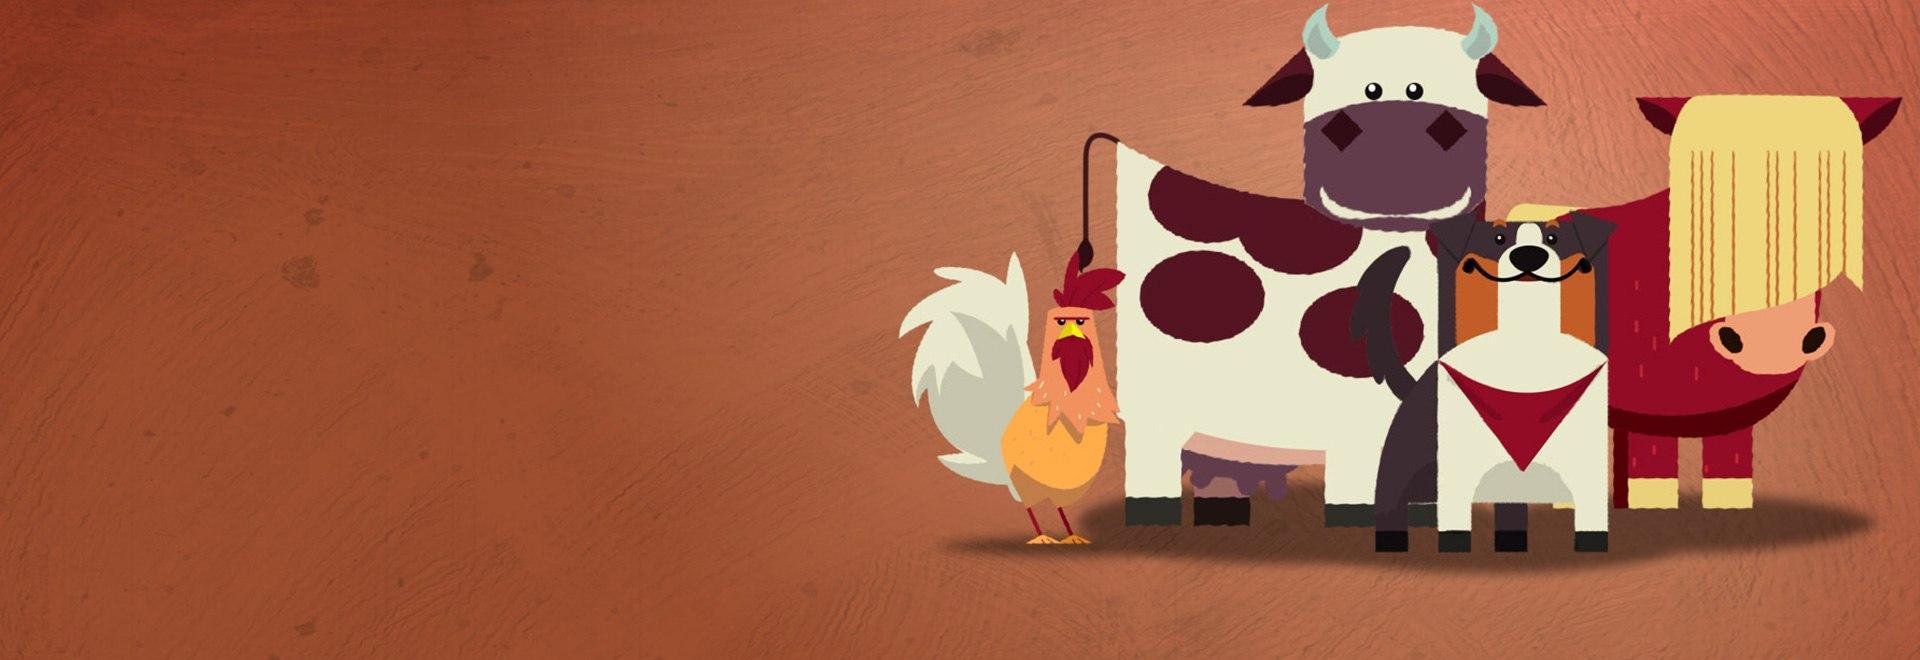 Beast of - Che avventure in fattoria!